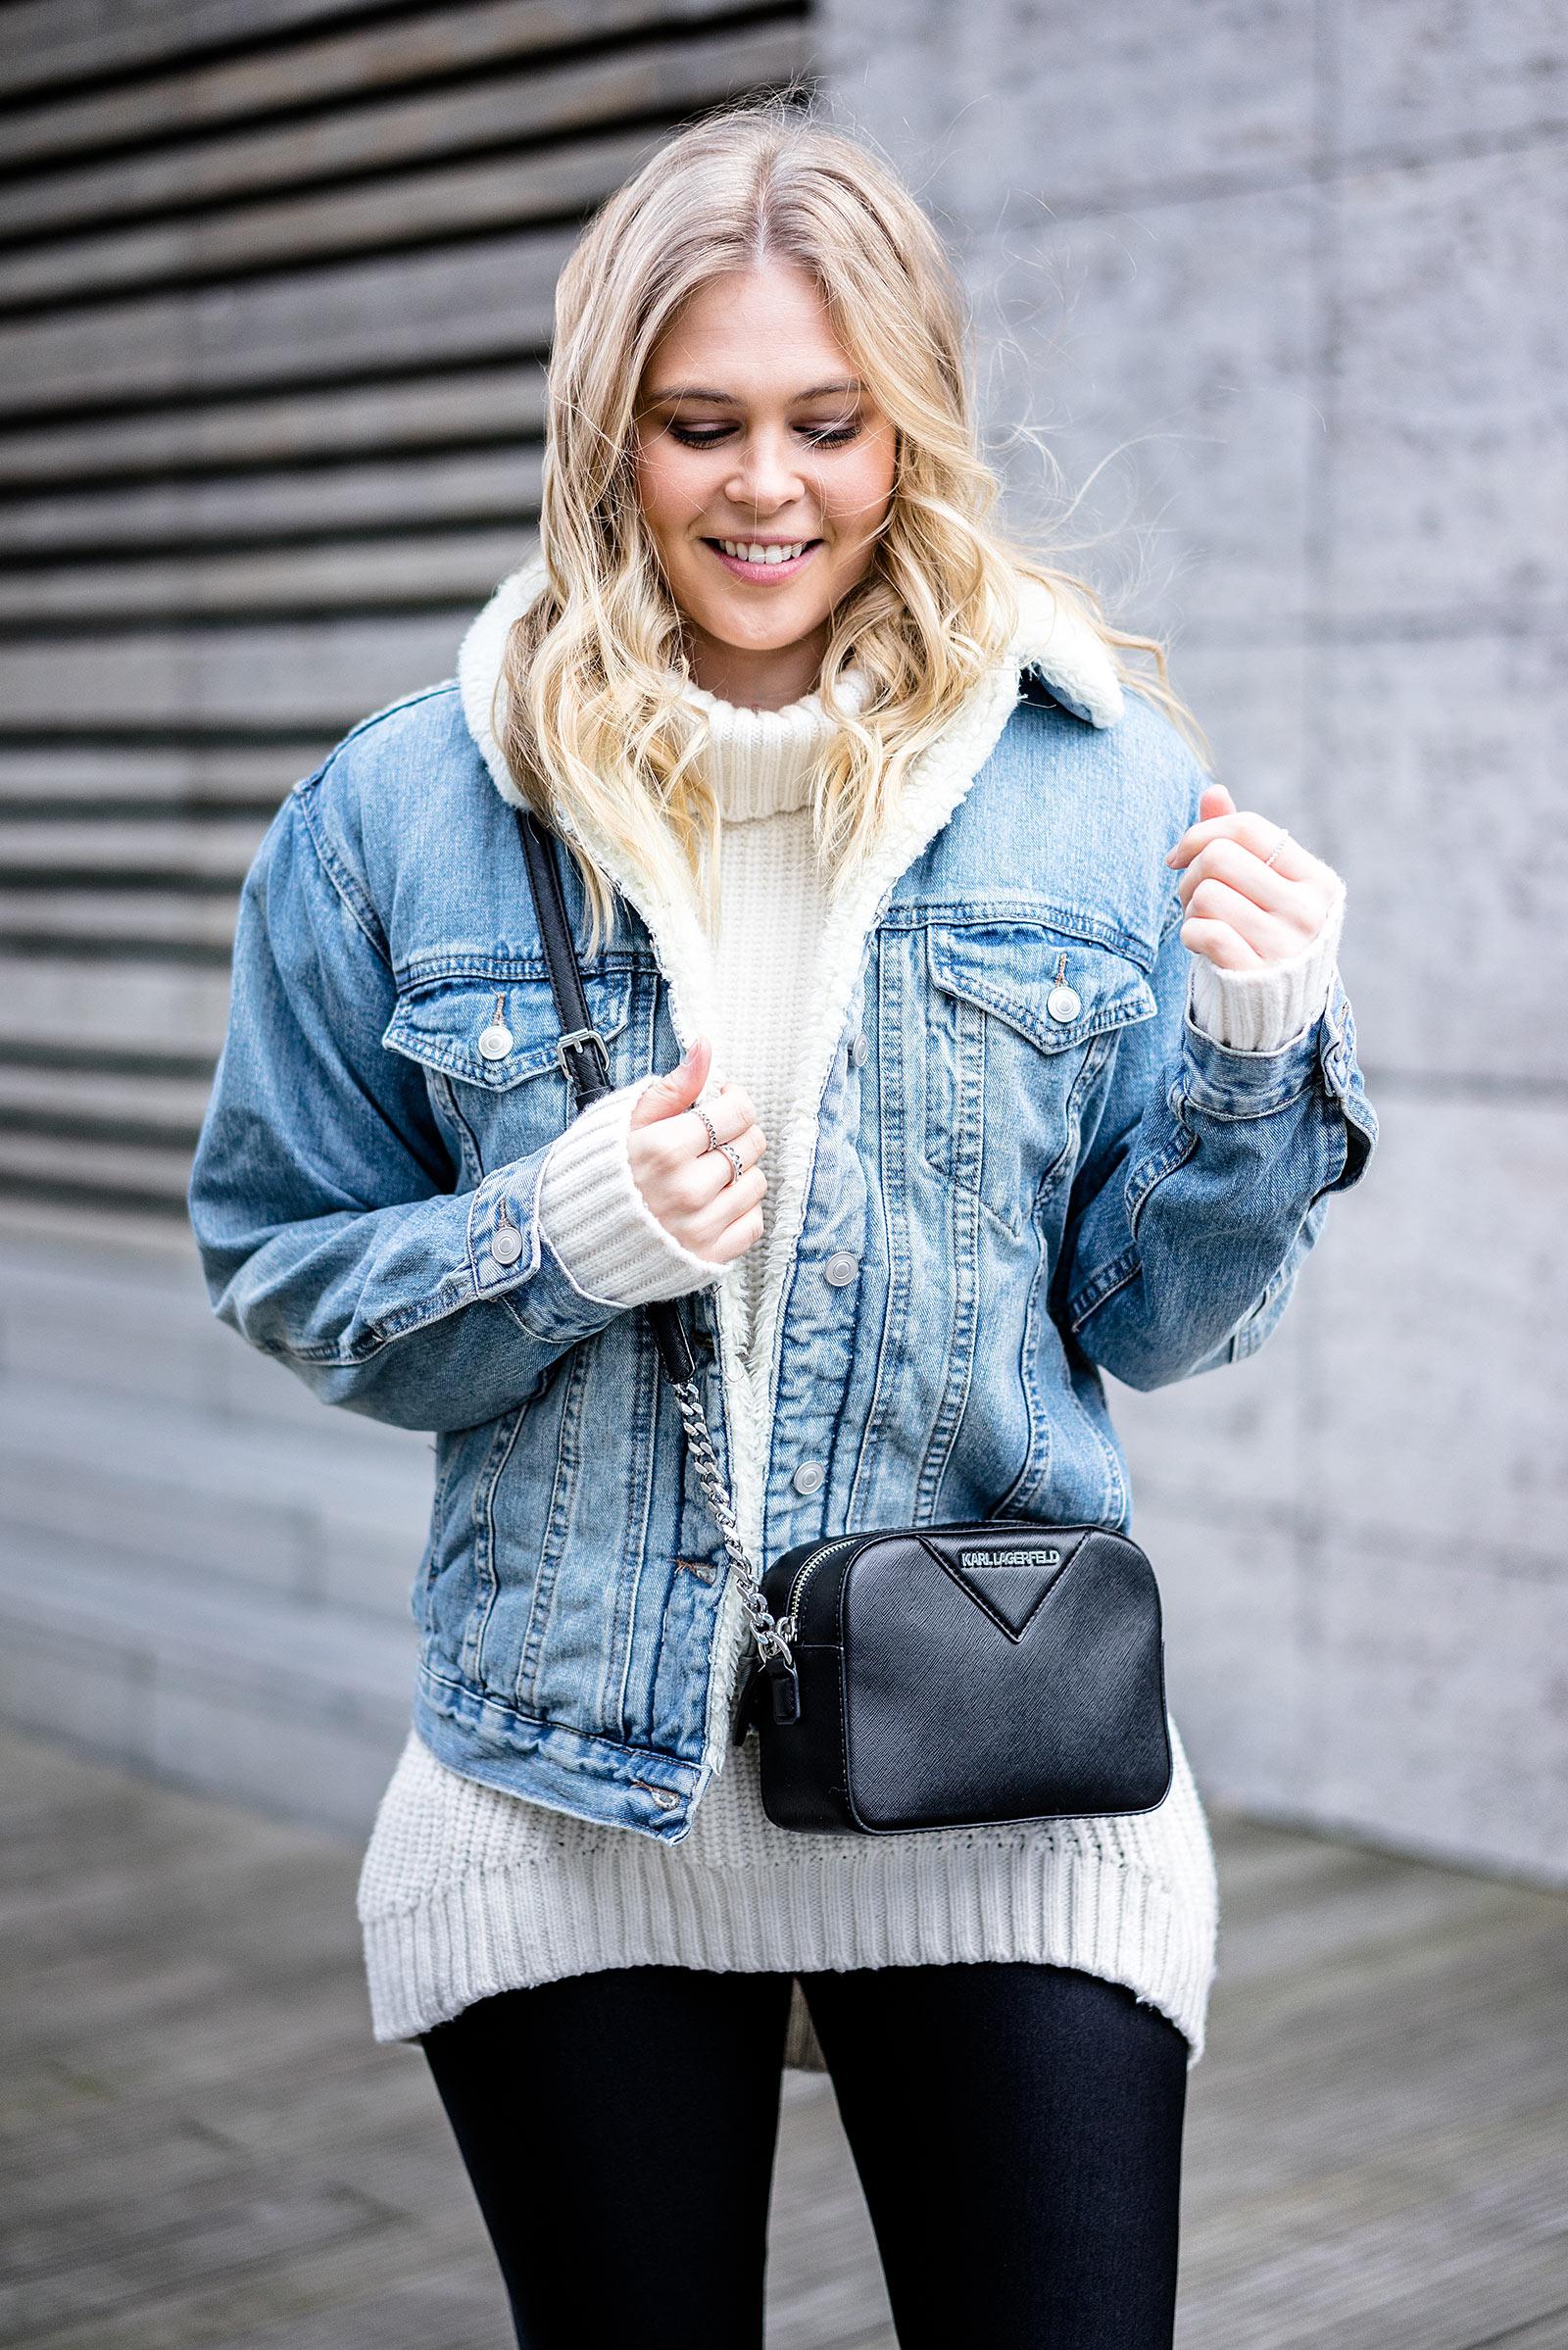 Karl Lagerfeld Tasche schwarz Outfit Modeblog Sunnyinga Jeansjacke mit Fell